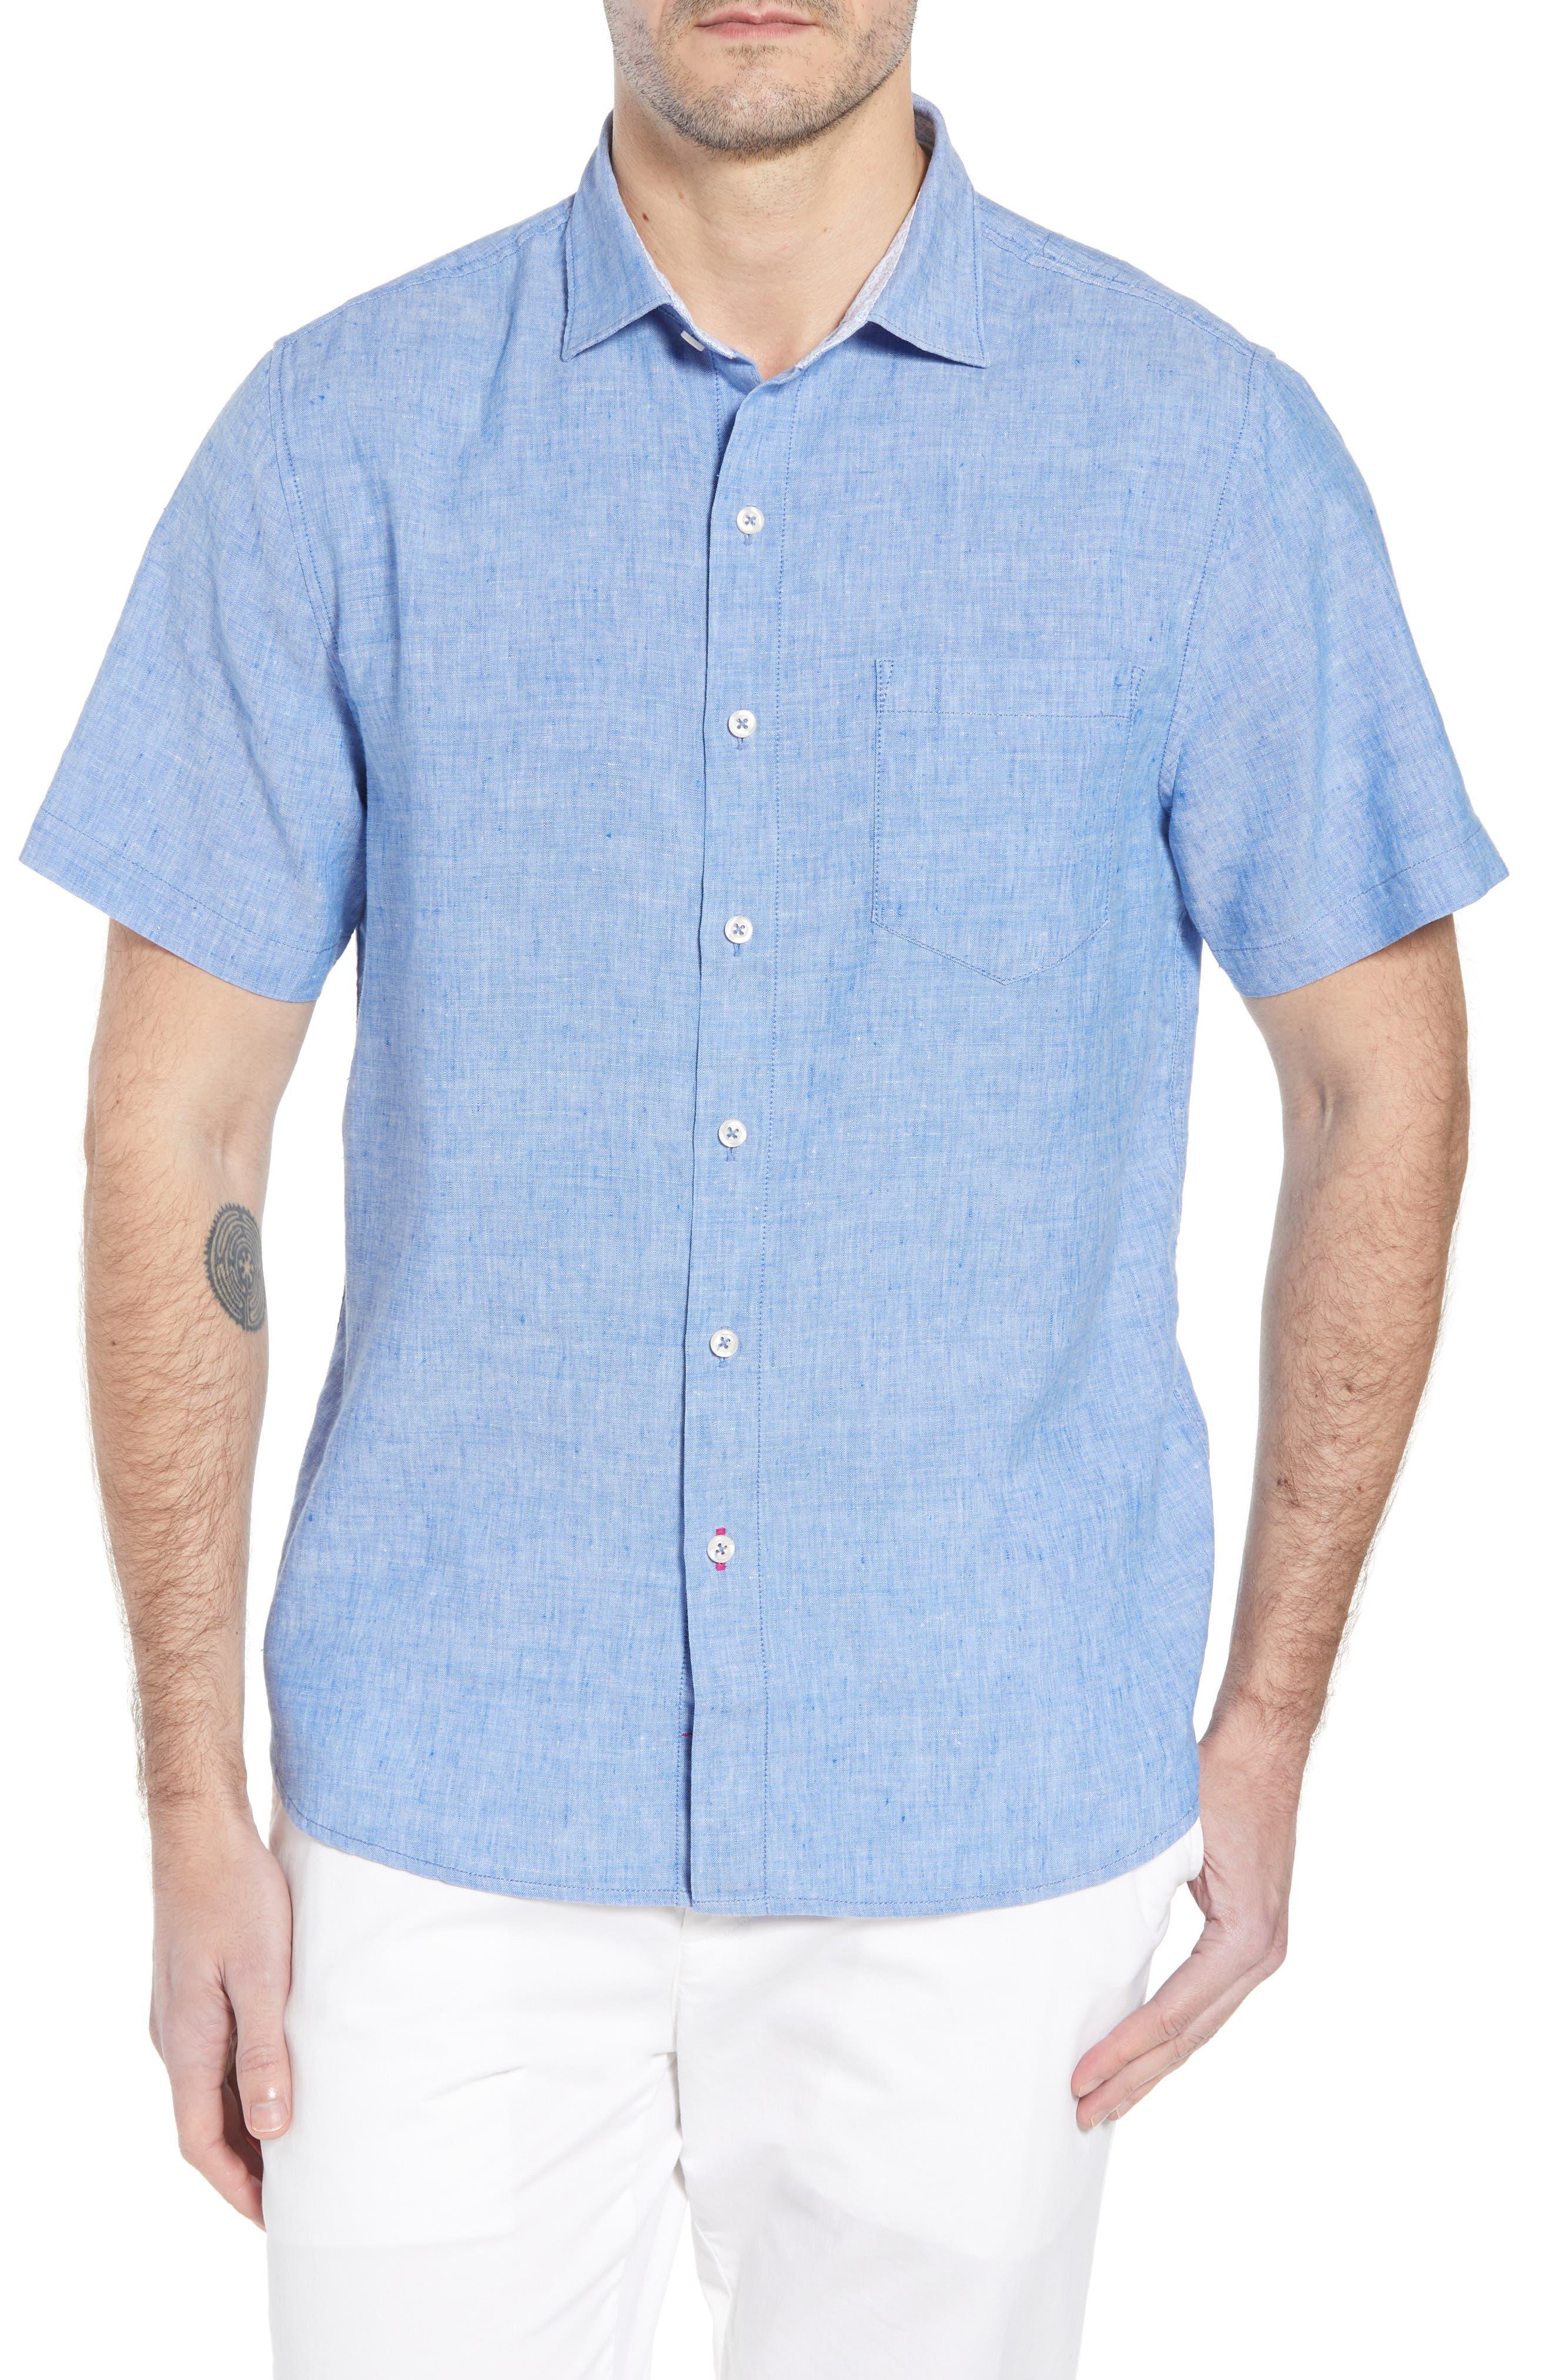 Lanai Tides Linen Blend Sport Shirt,                             Main thumbnail 1, color,                             Cobalt Sea